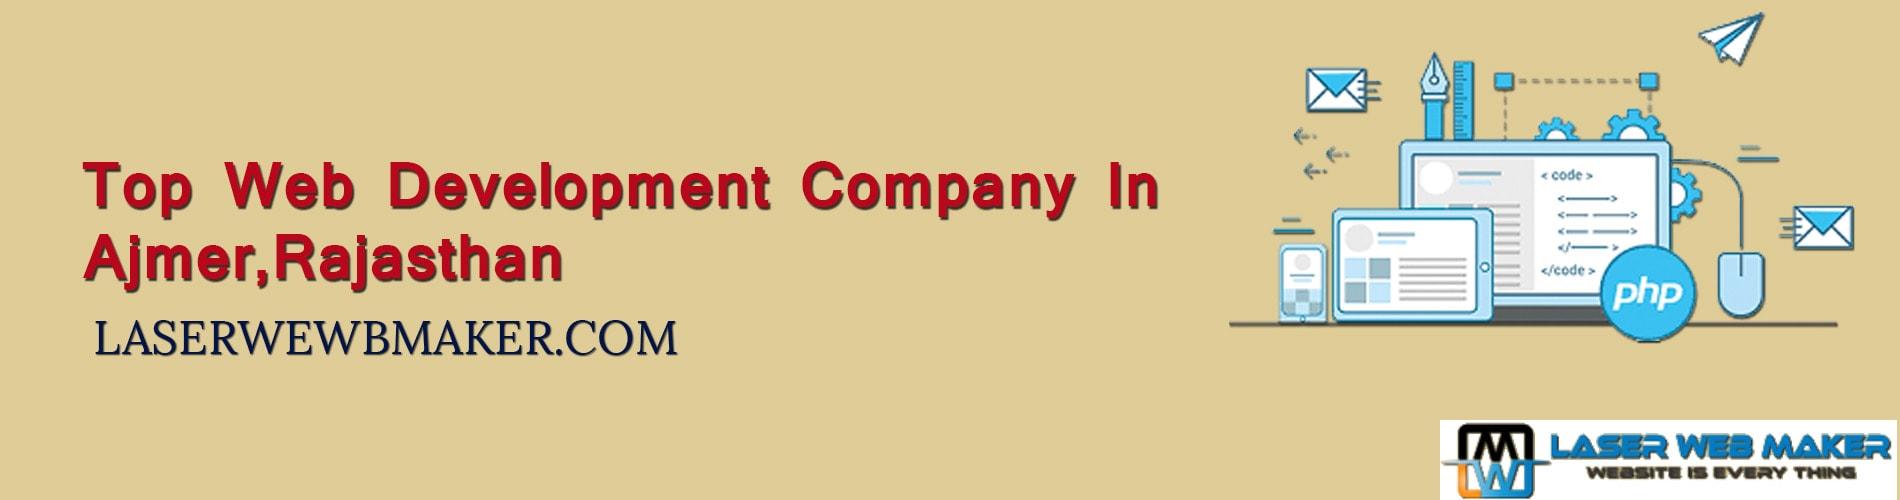 Top Web Development Company In Ajmer, Rajasthan